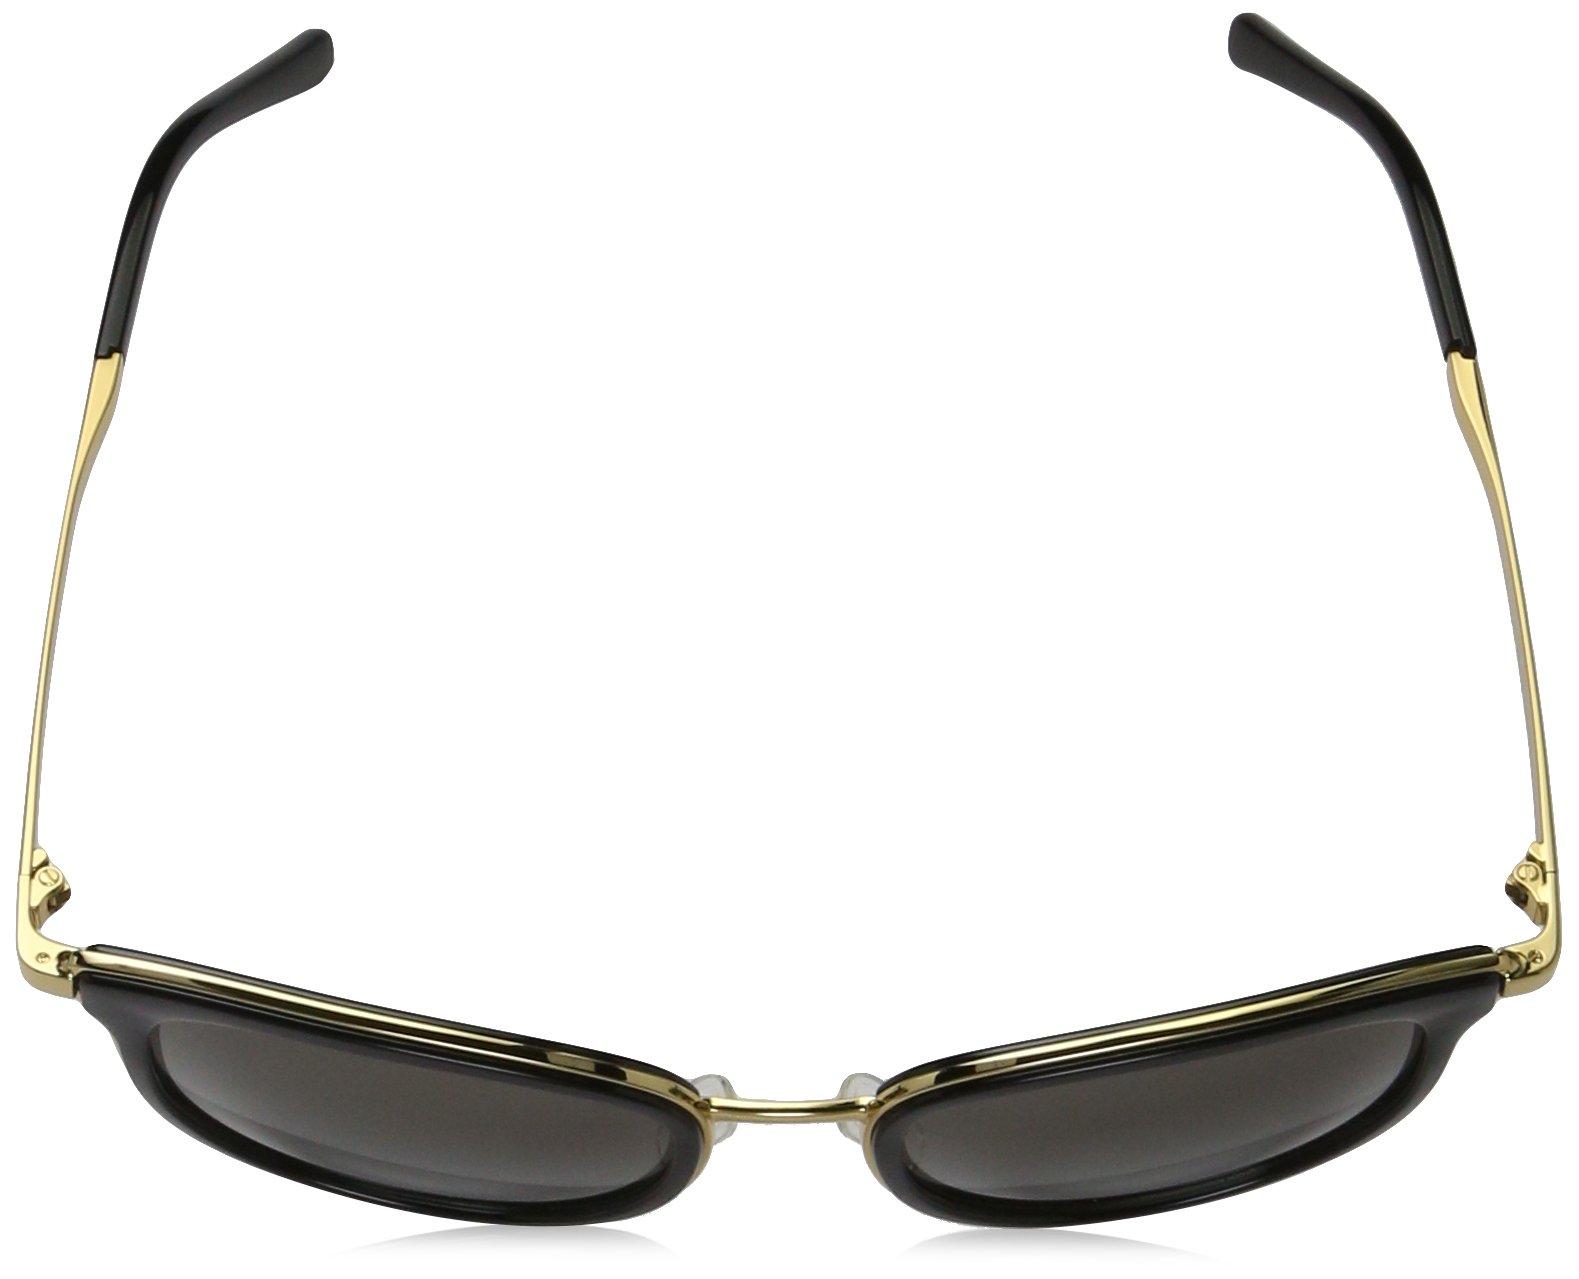 Michael Kors Women's Adrianna I MK1010 Black/Gold Sunglasses by Michael Kors (Image #4)